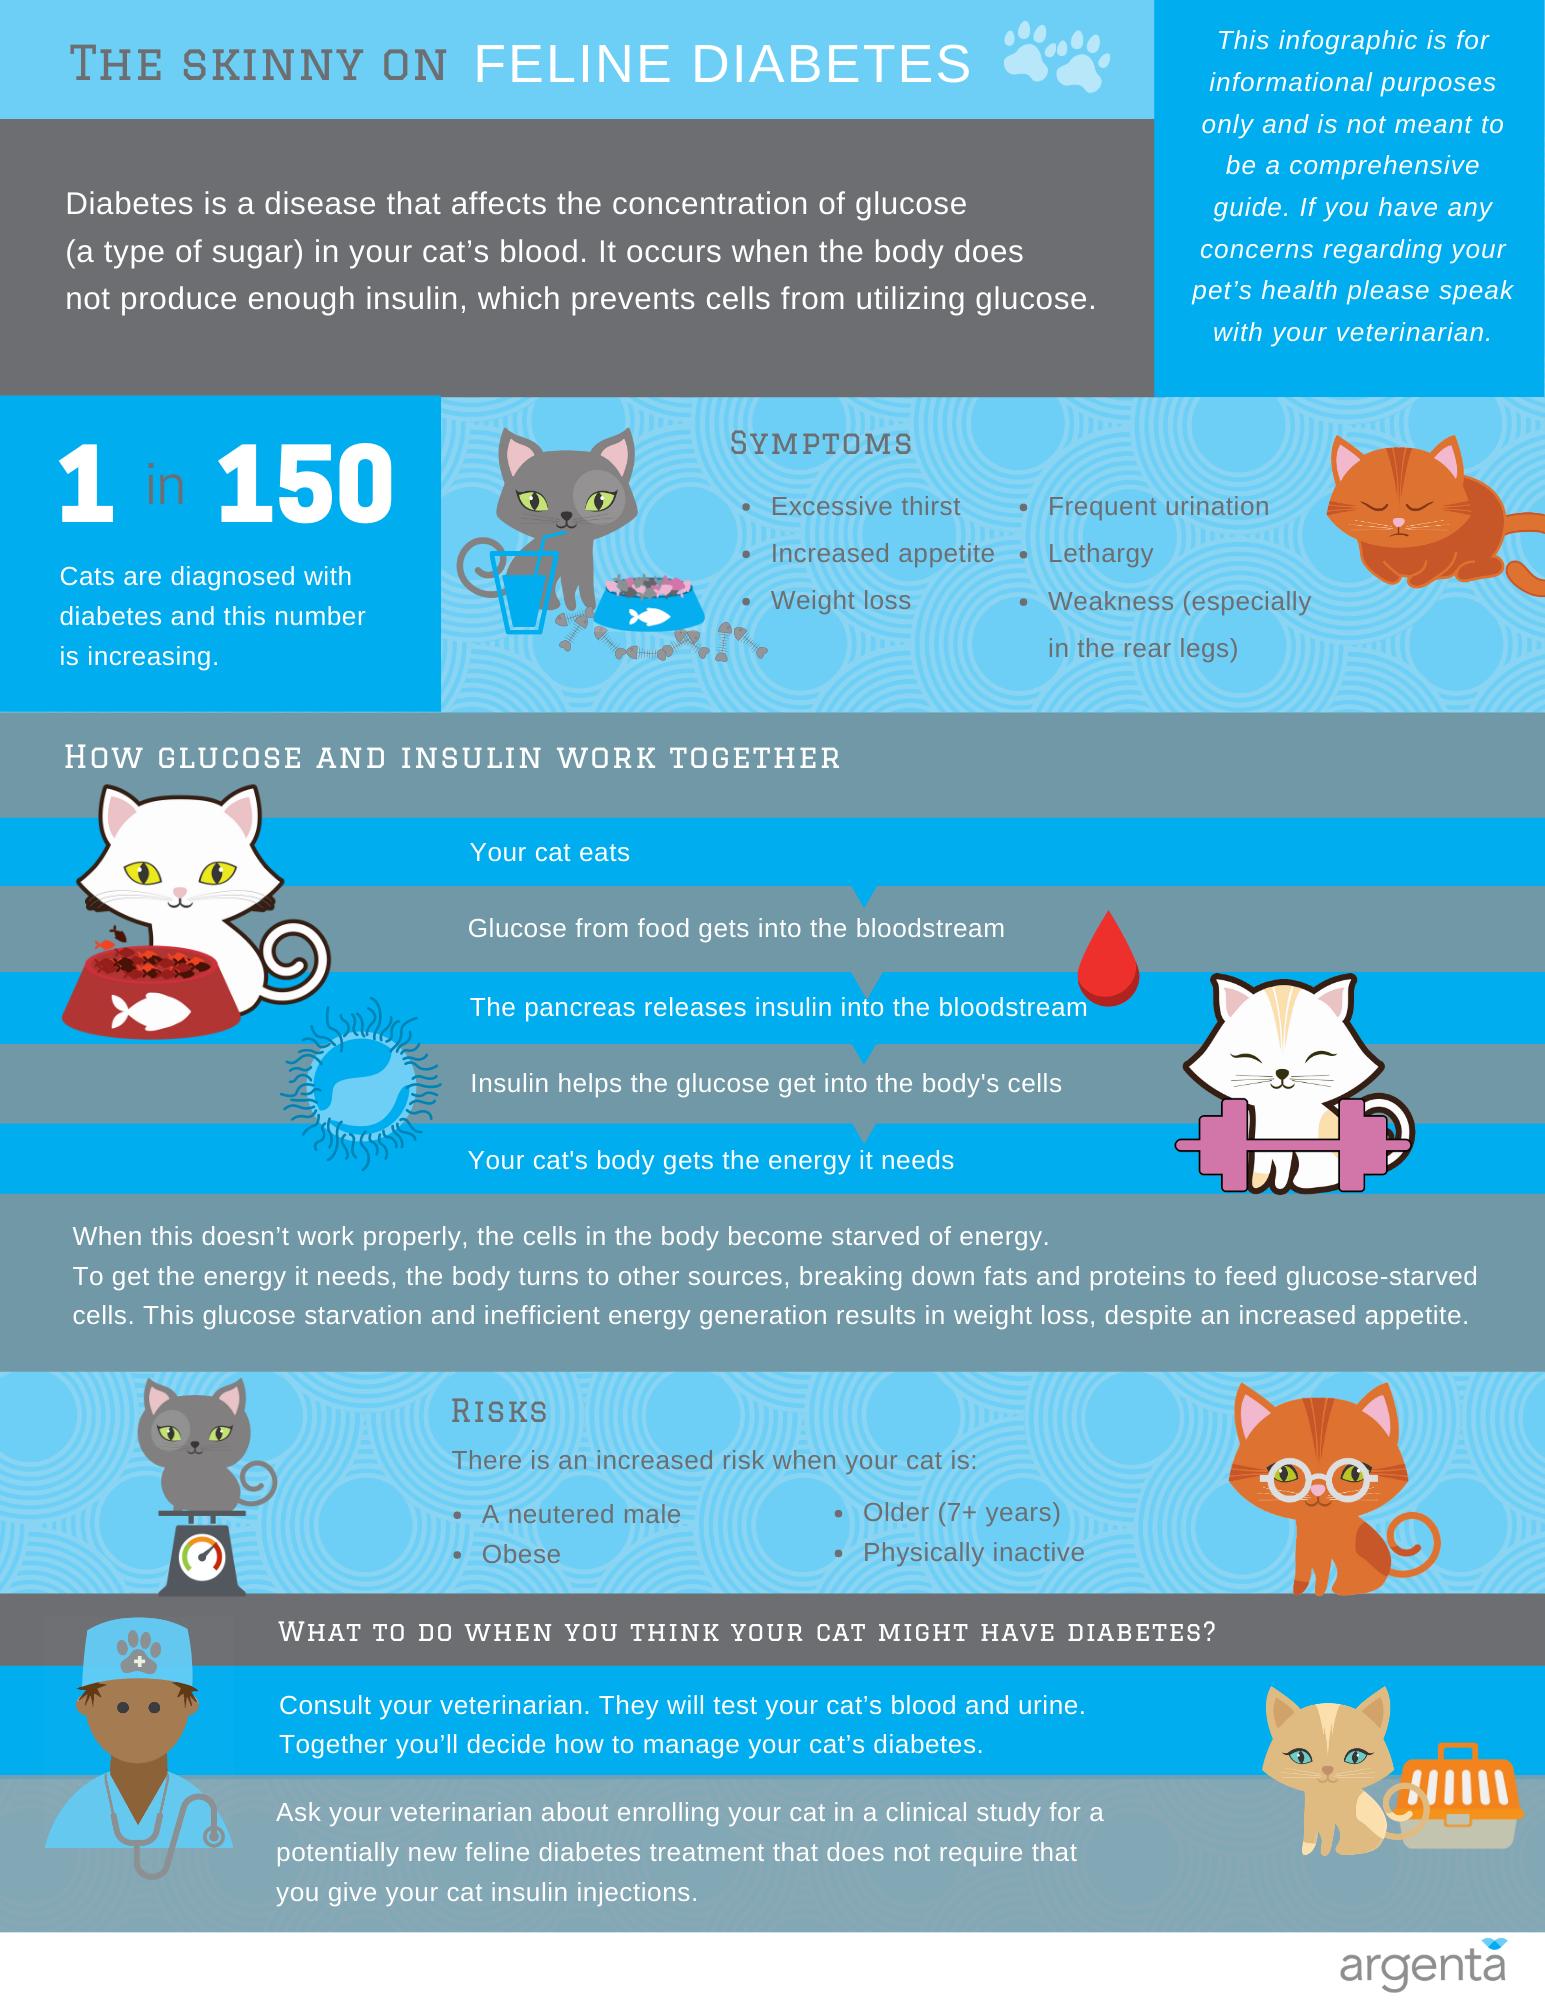 The Skinny on Feline Diabetes